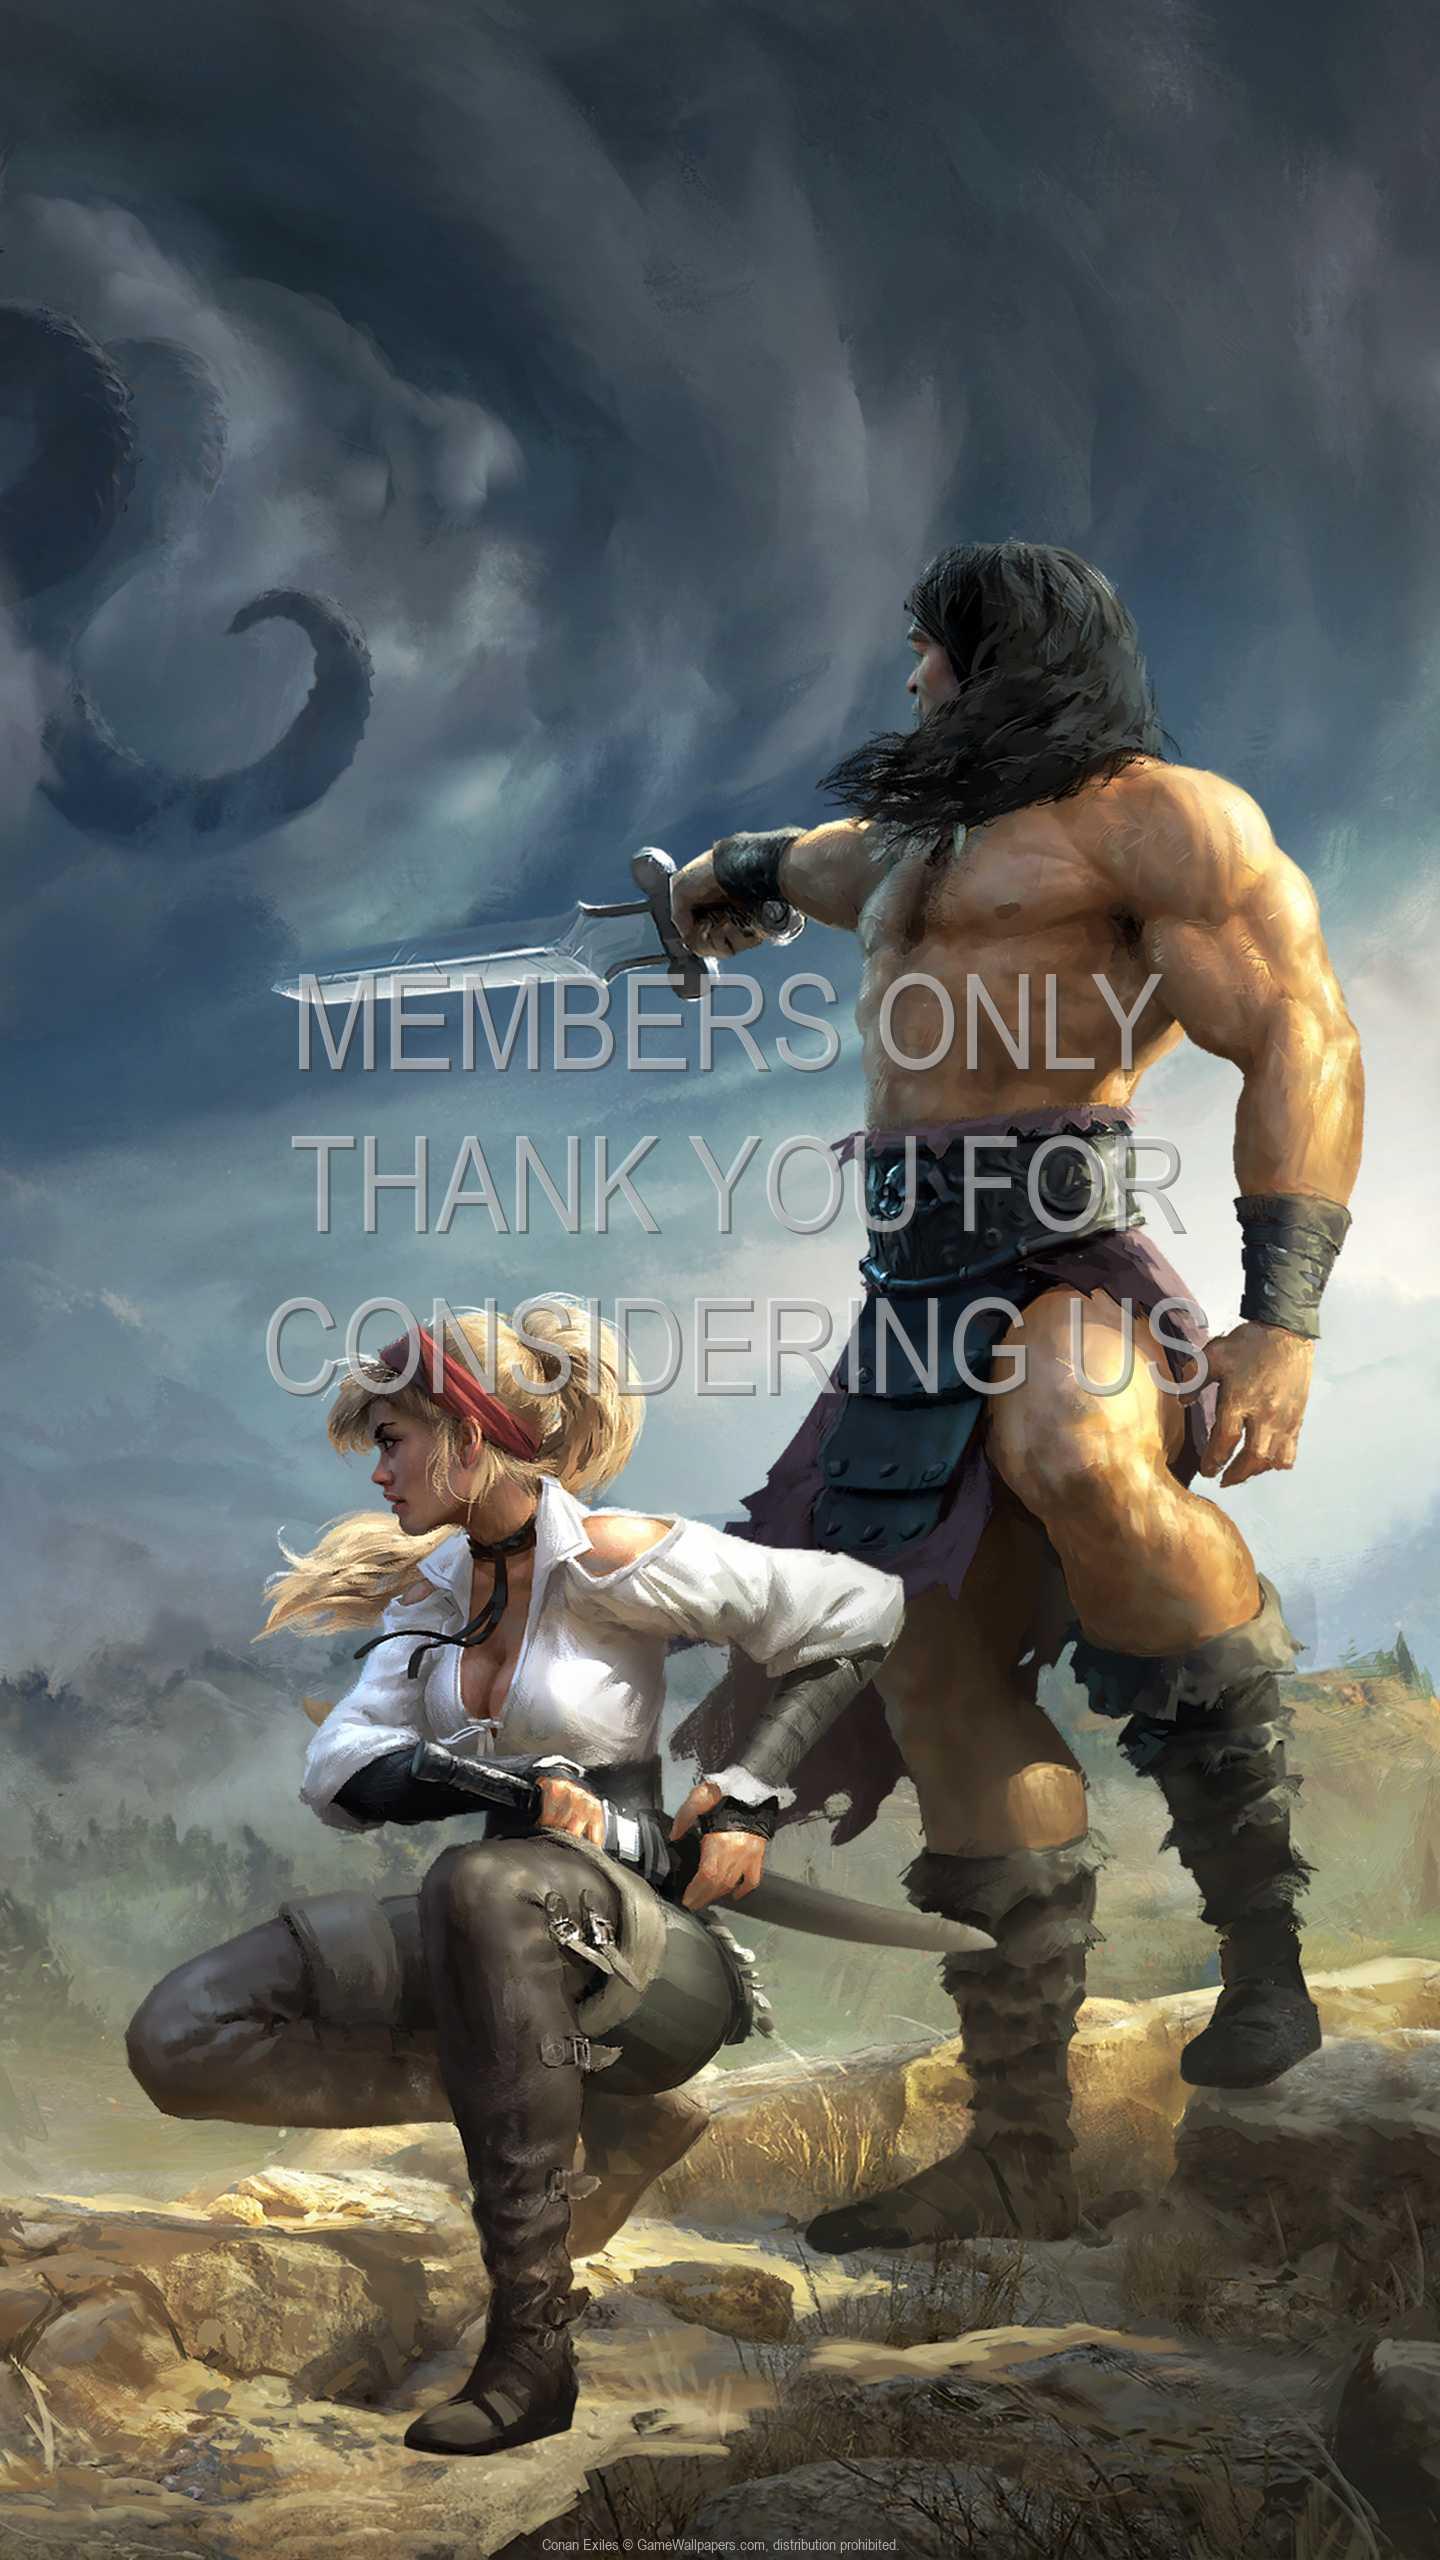 Conan Exiles 1440p Vertical Mobile fond d'écran 02